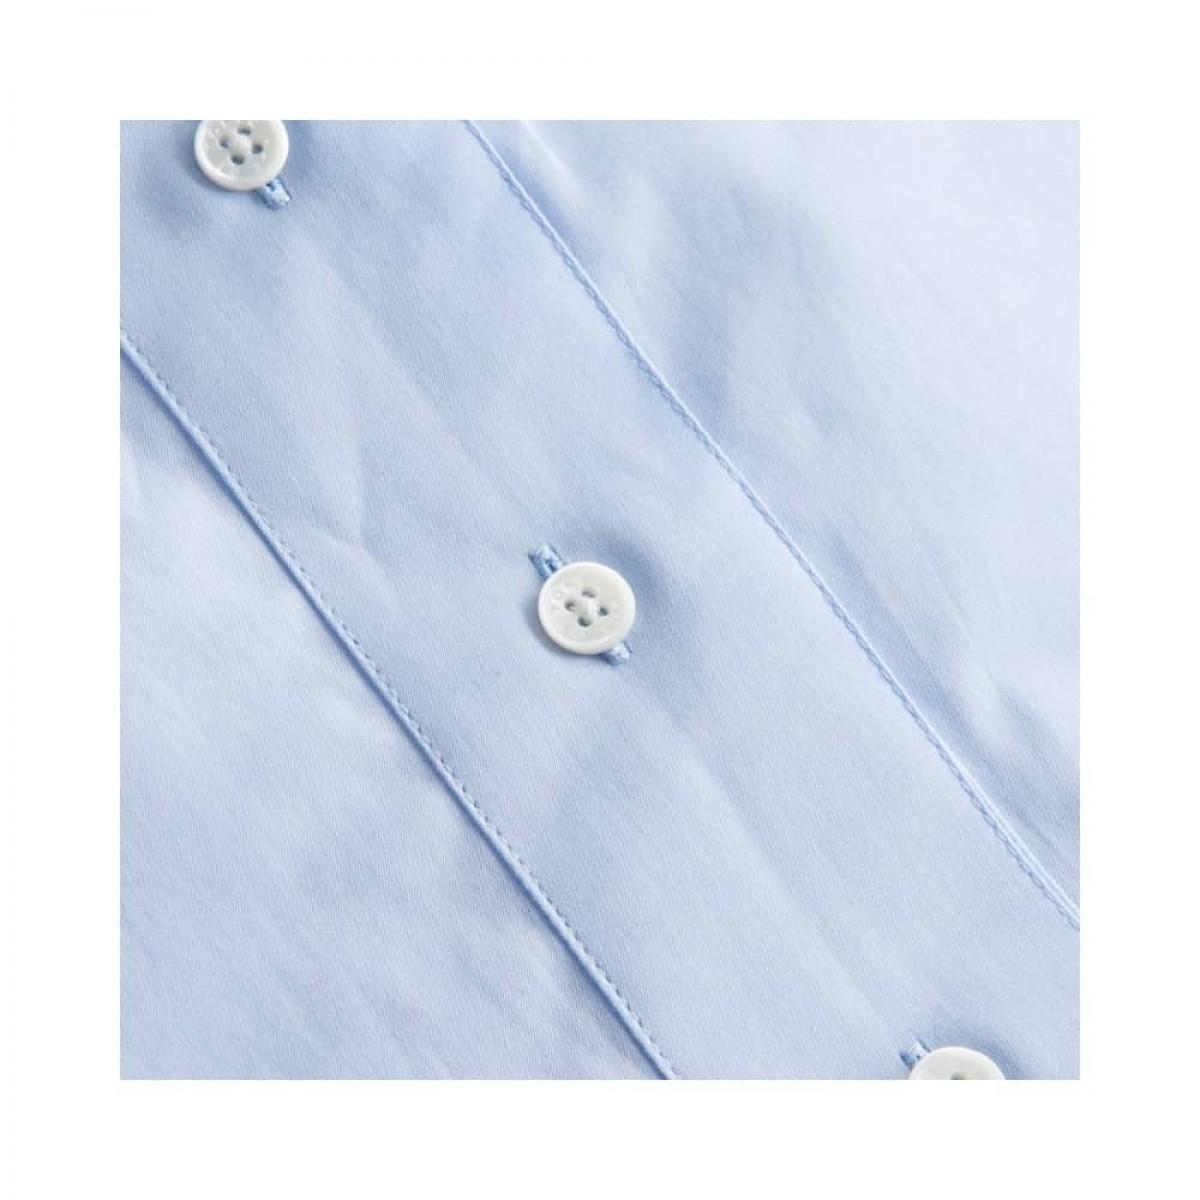 sera skjorte - light blue - knap detalje